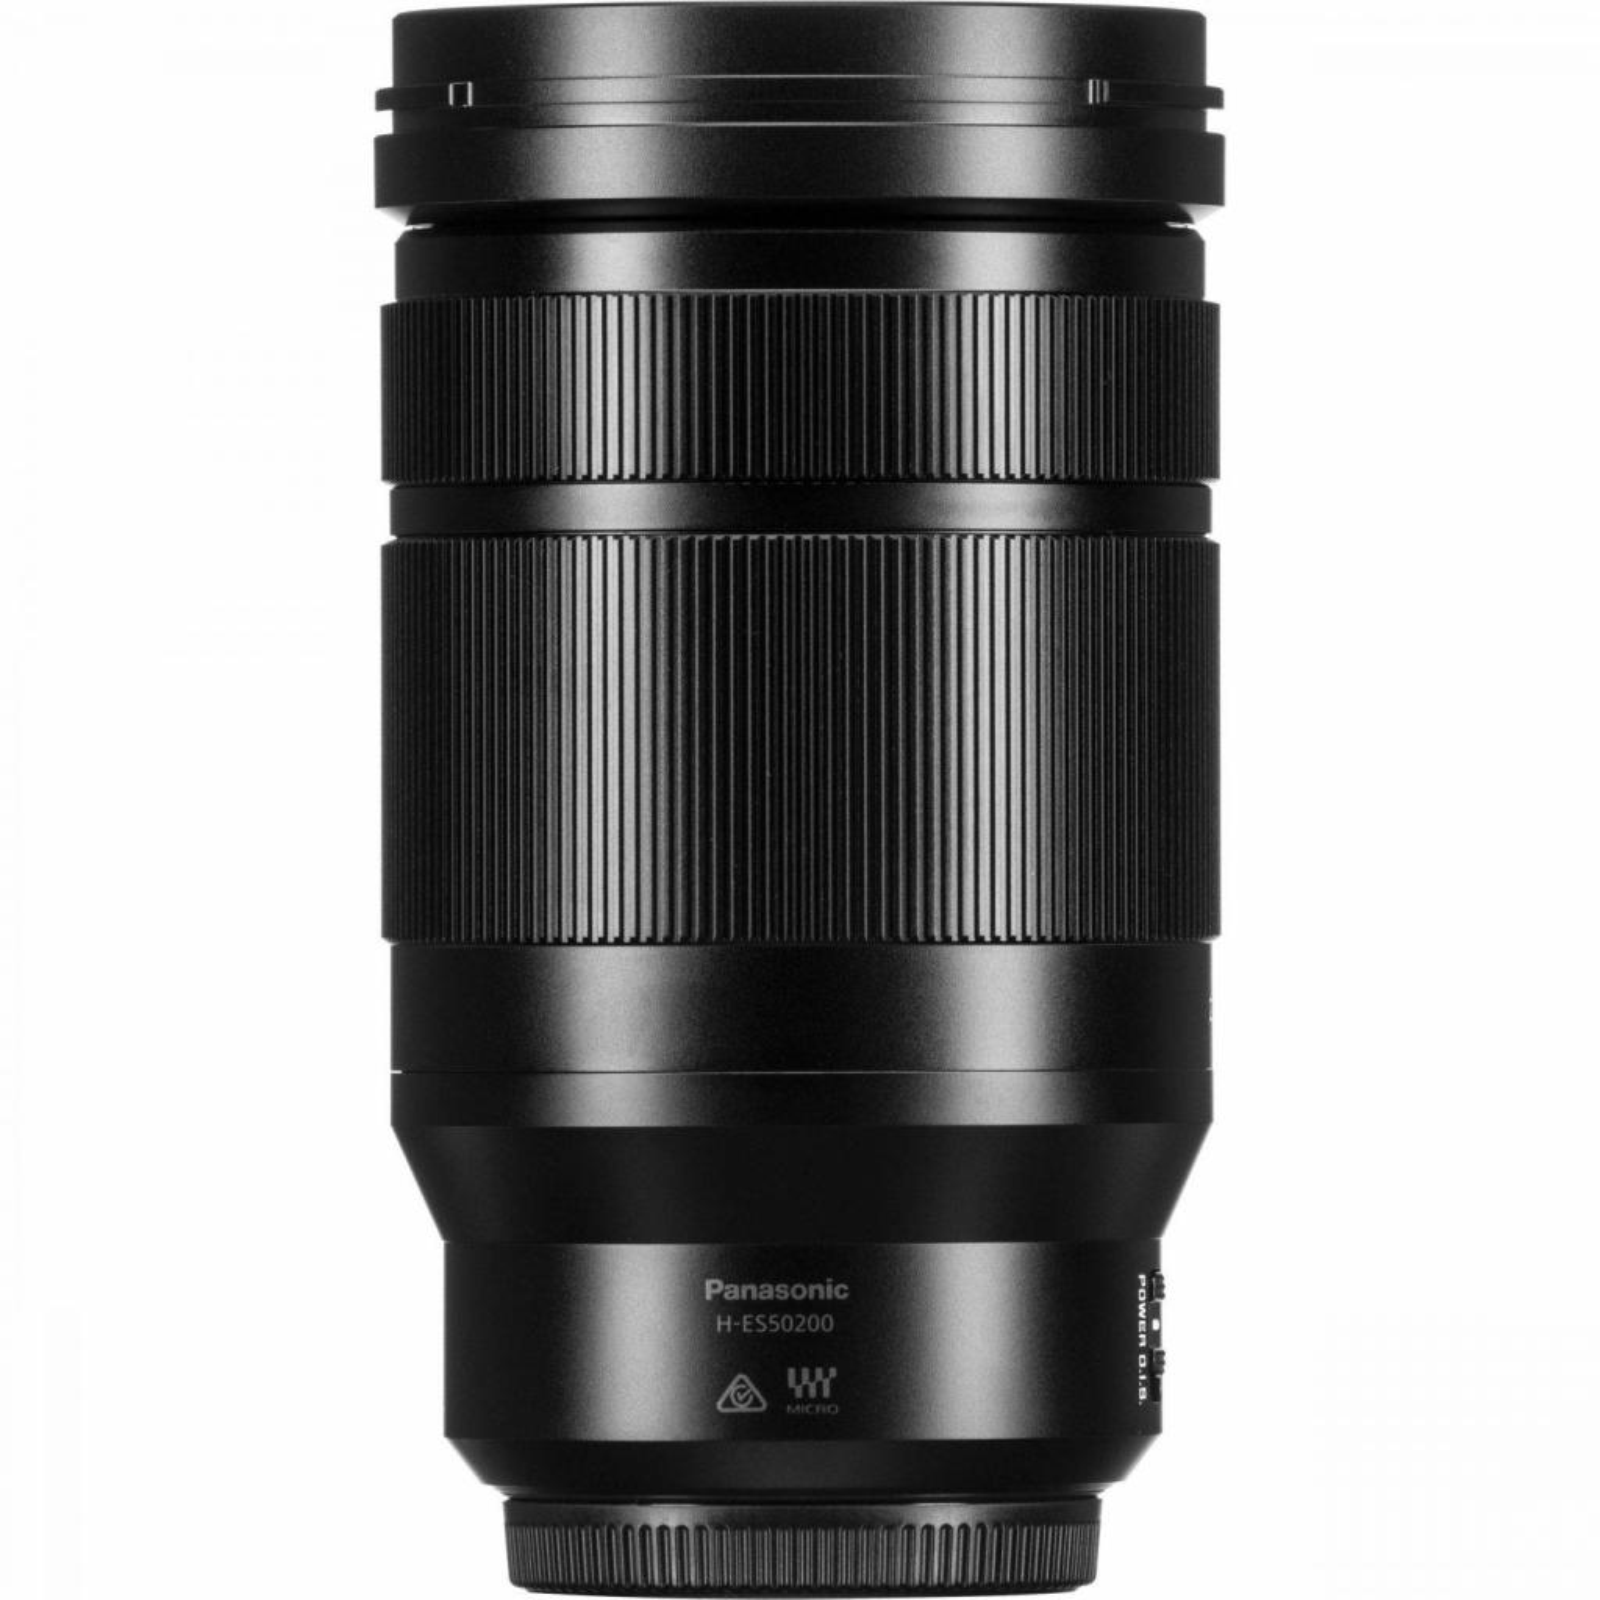 Объектив PANASONIC Micro 4/3 Lens 50-200 mm f/2.8-4 ASPH. POWER O.I.S. Leica DG (H-ES50200E) изображение 6